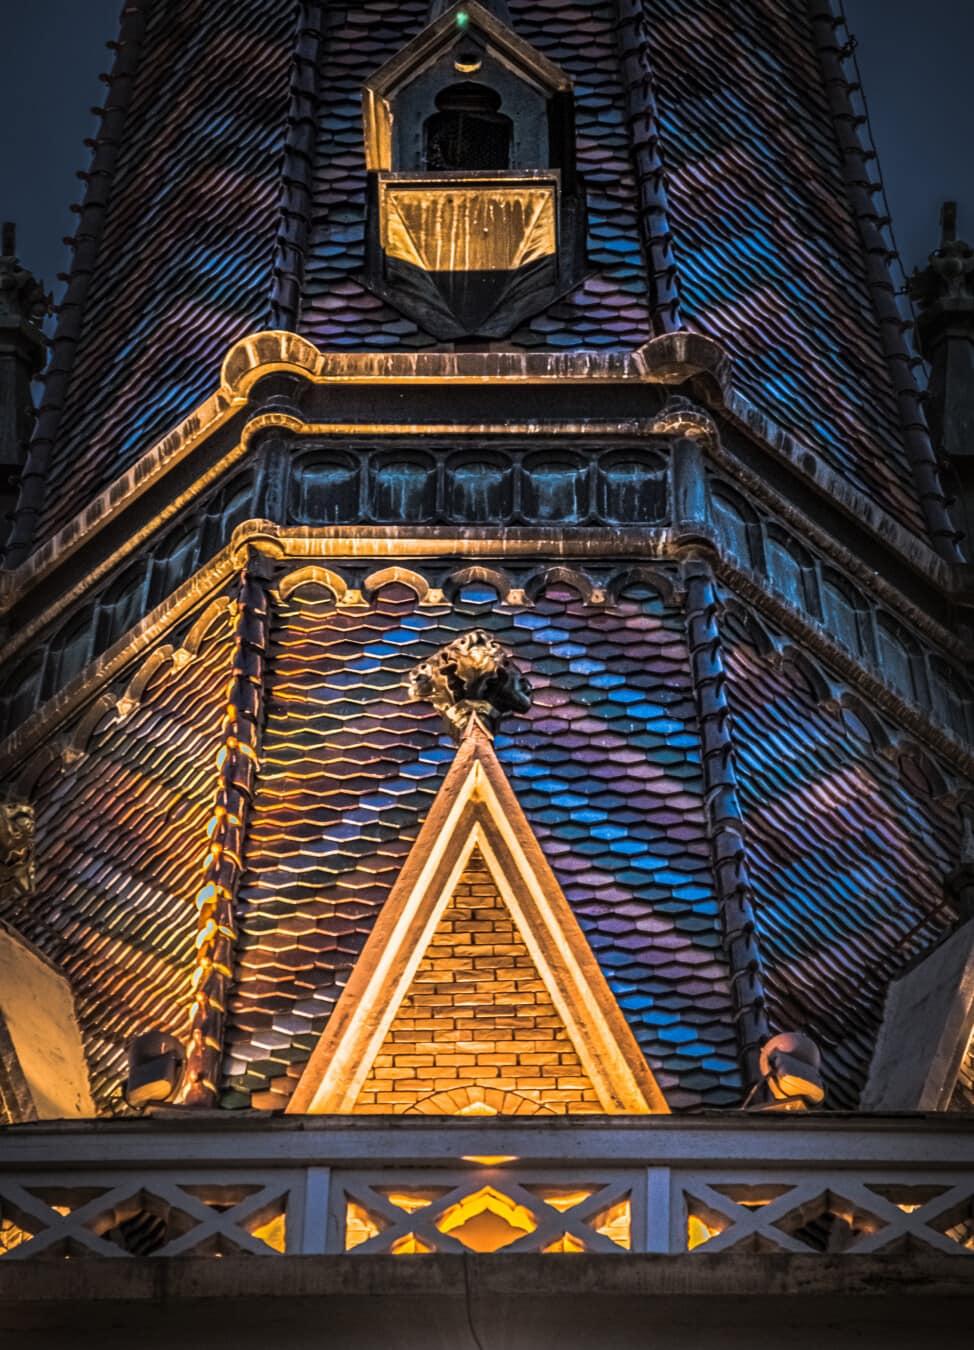 grotesk gargoyle, tagterrasse, Gotisk, kirketårnet, Tag, nat, bygning, kirke, temppeli, vartegn